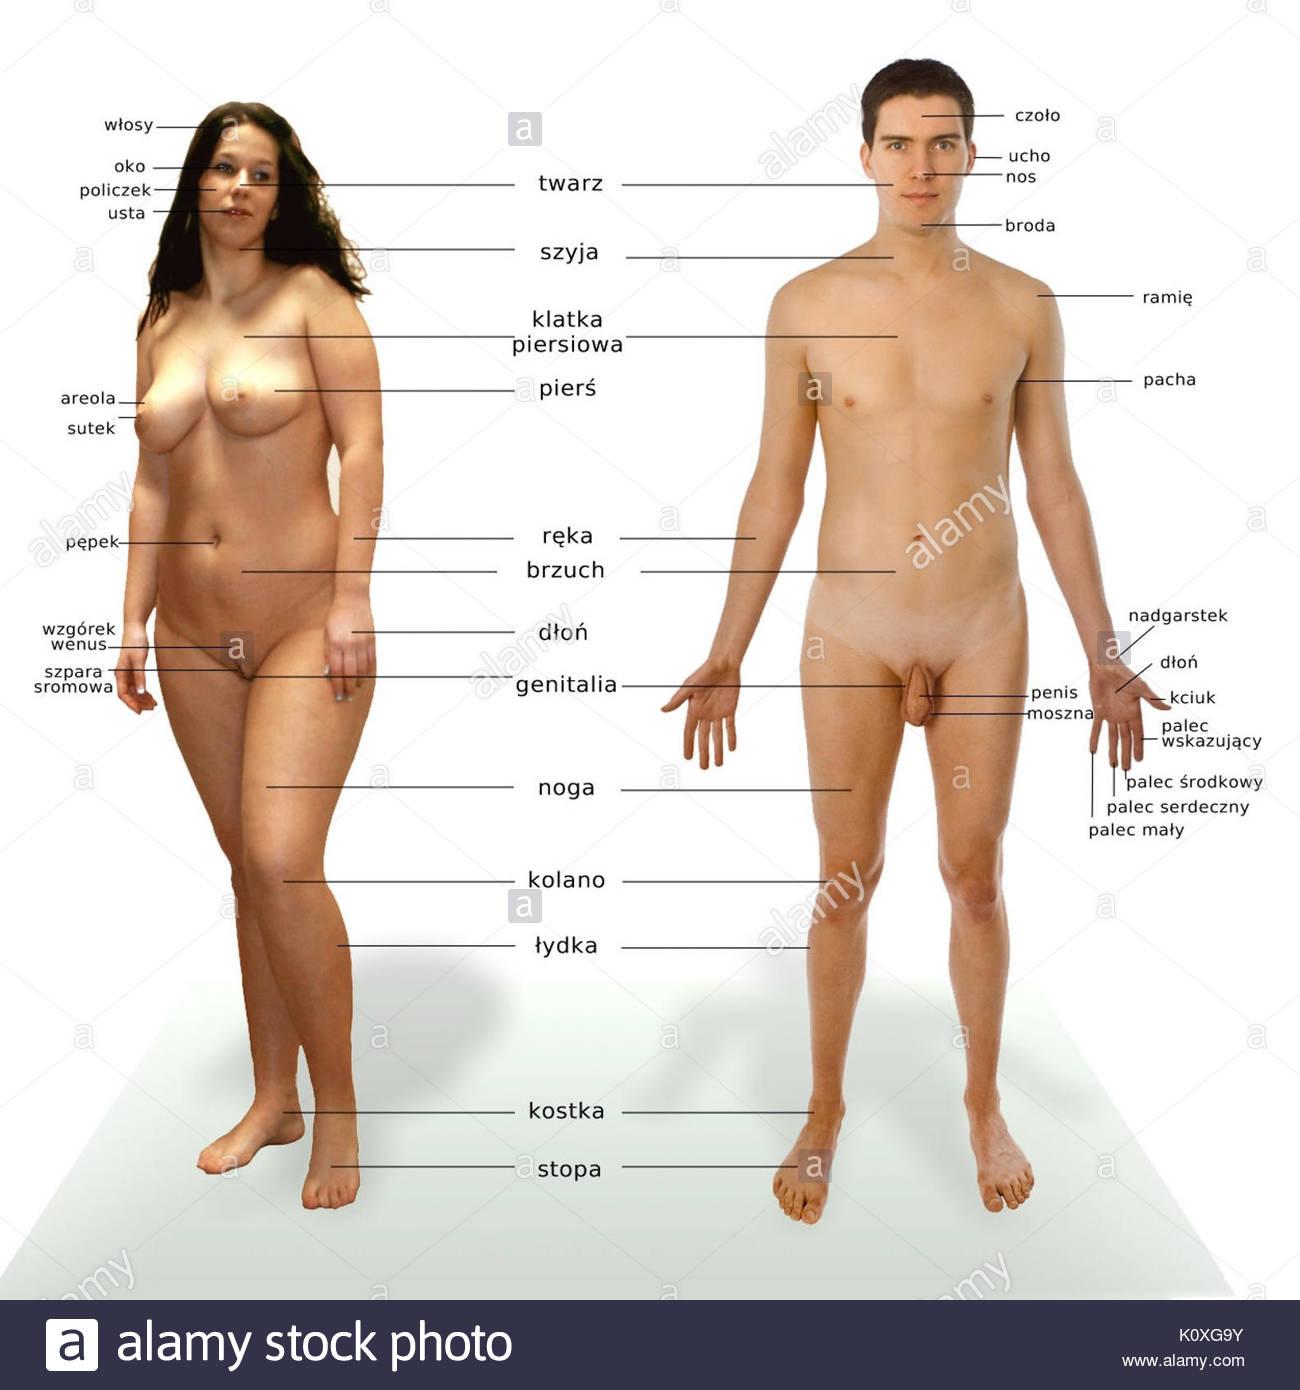 Anatomia czlowieka Immagini Stock